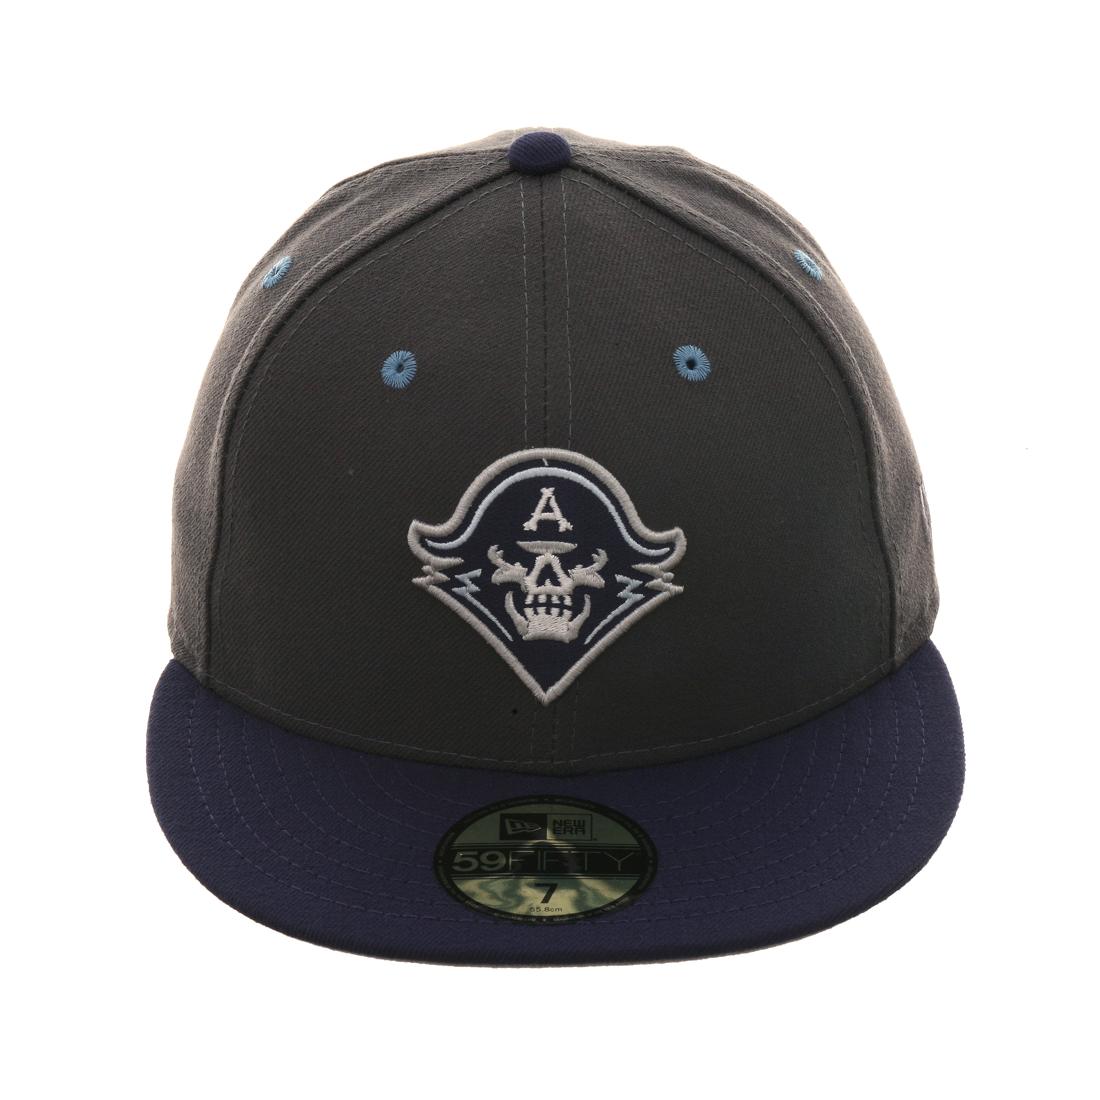 Exclusive New Era 59Fifty Milwaukee Admirals Hat - 2T Graphite 50f55a77e